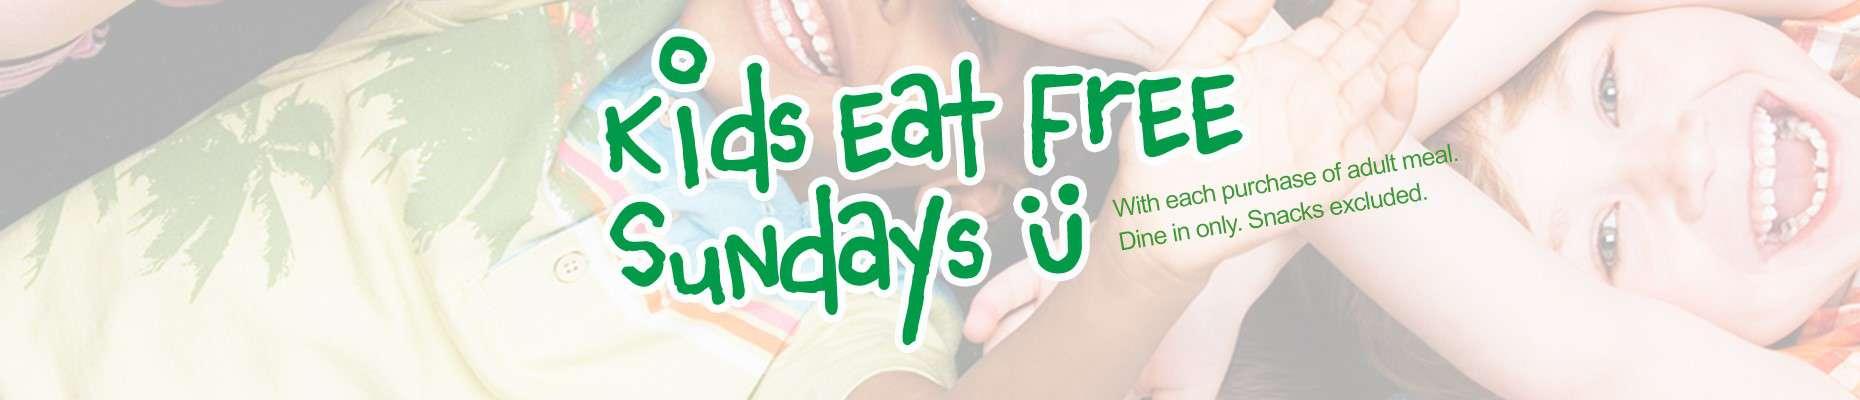 Kids Eat Free Sundays Snacks Excluded | EVOS Feel Great Food